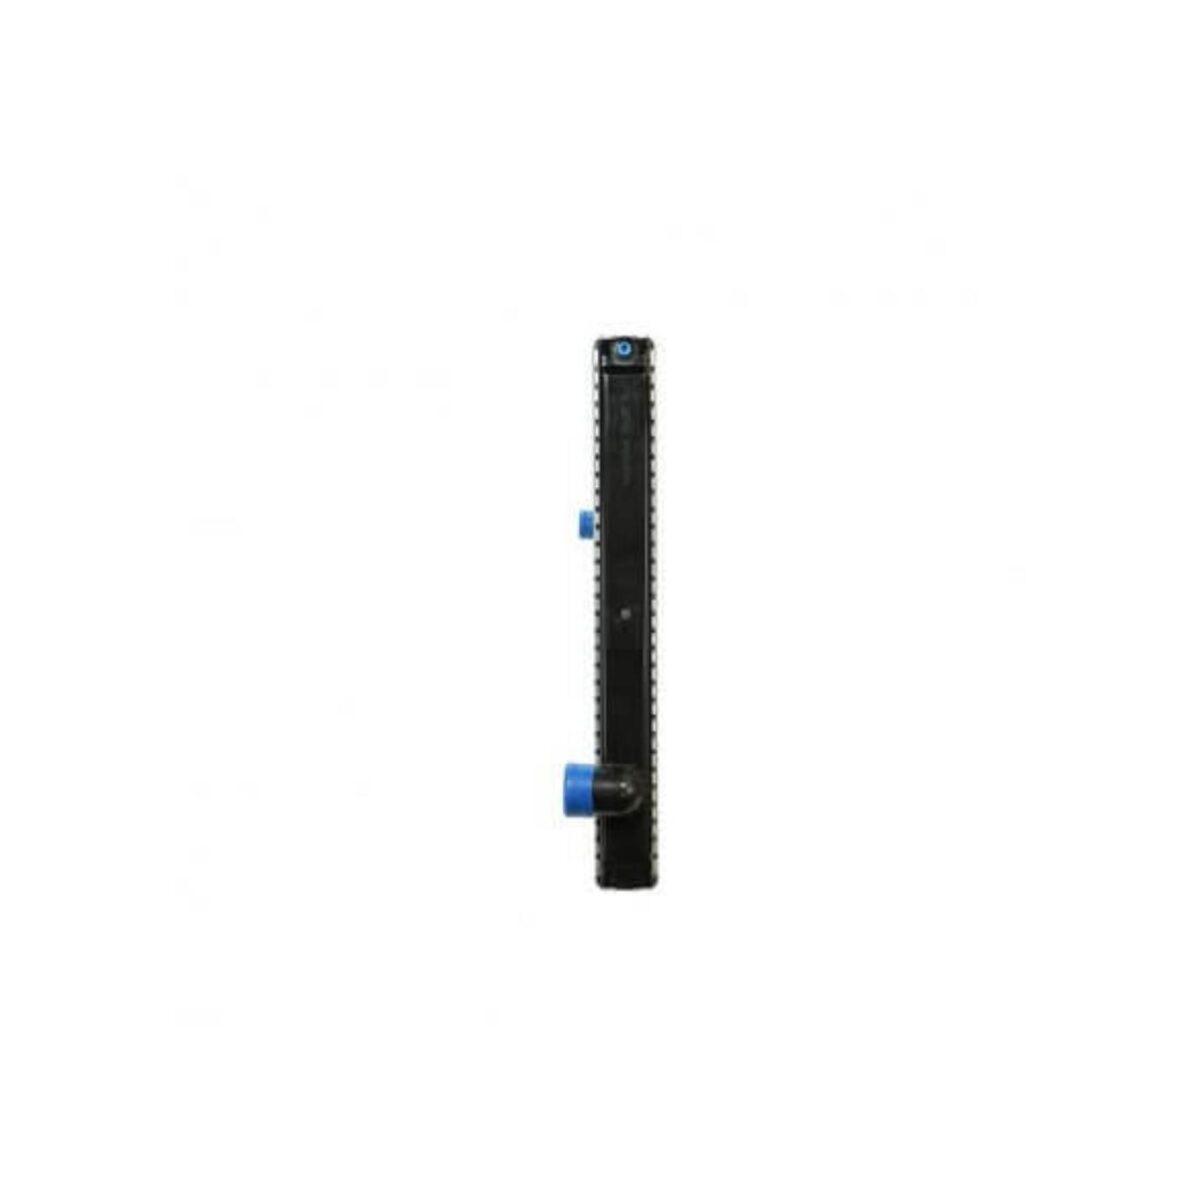 ford sterling lt 9500 at 9500 series 98 99 radiator oem vab1030138 5